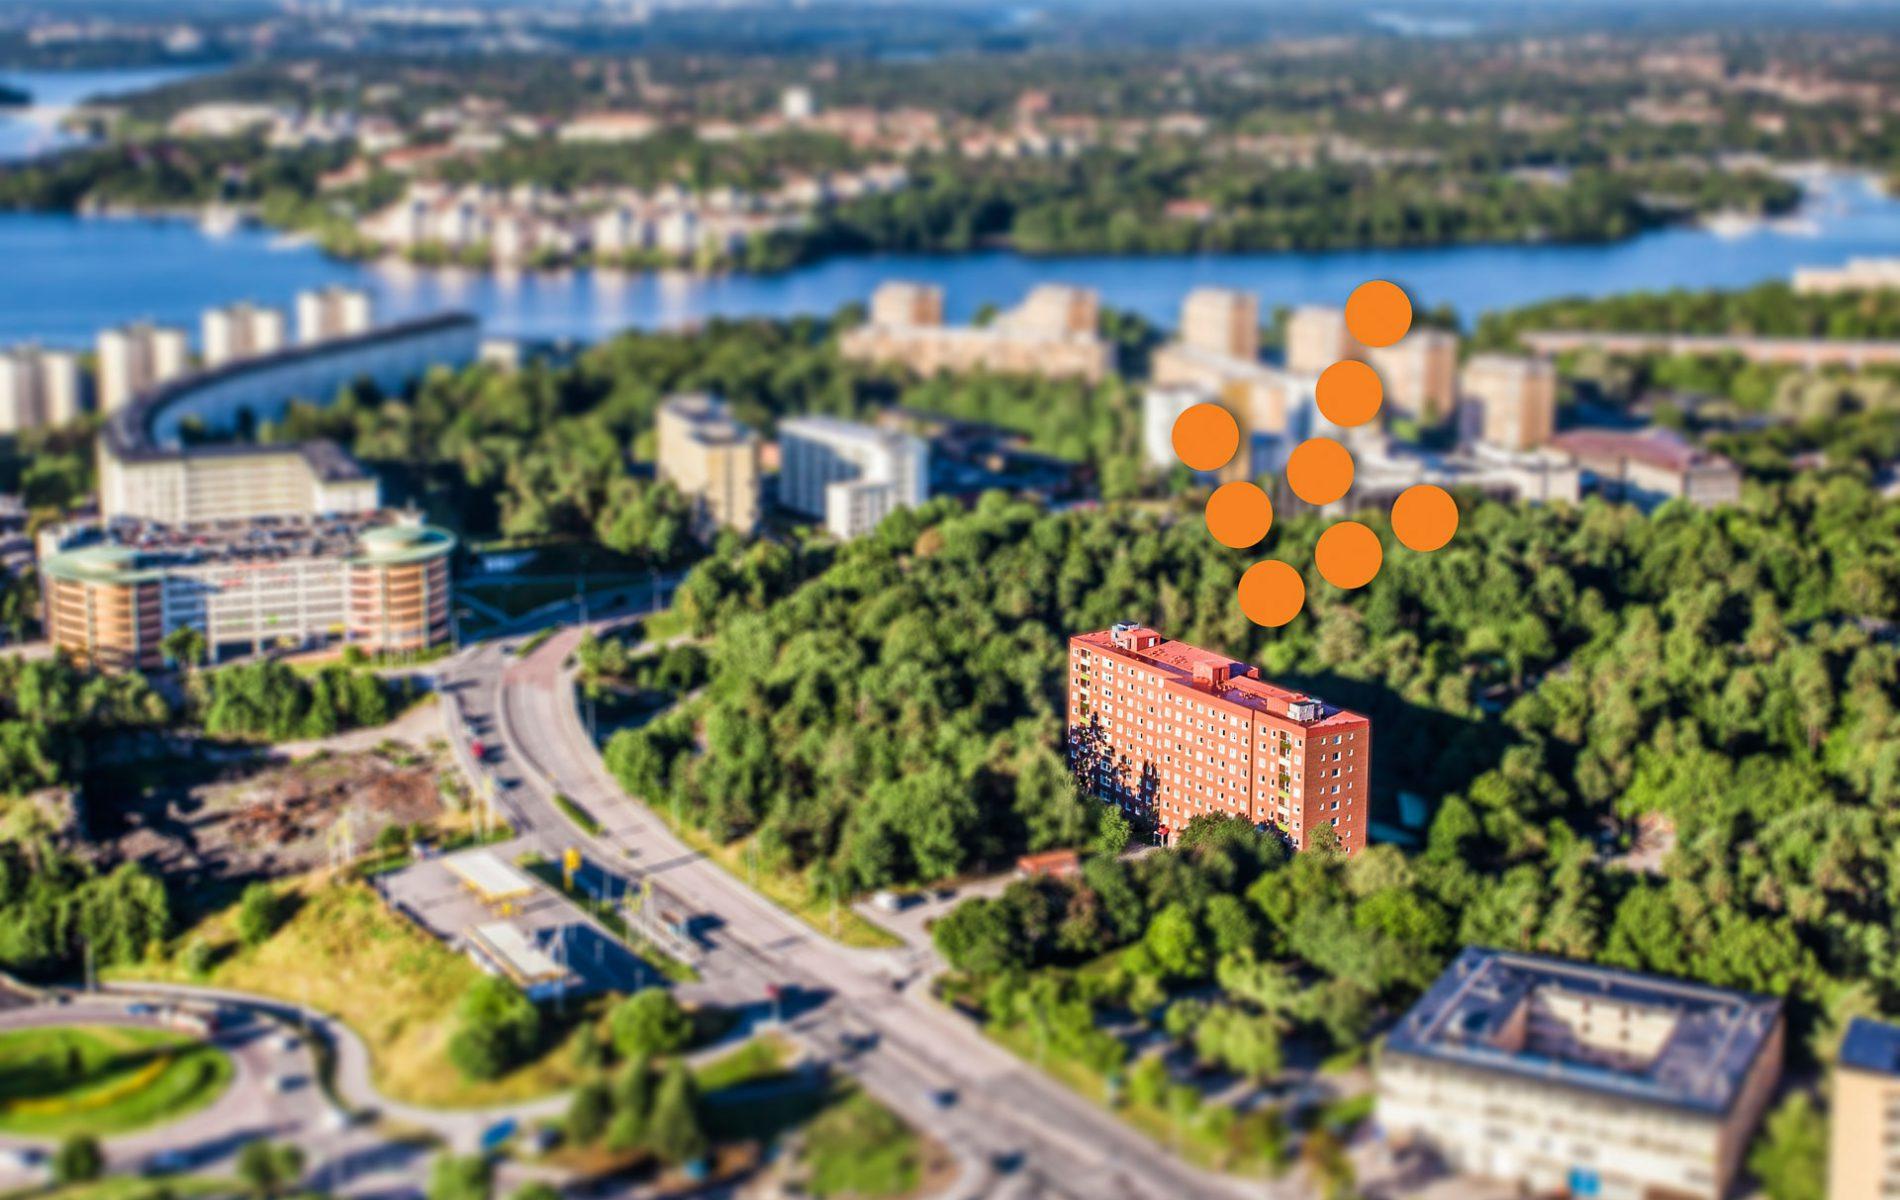 Flygbild av fastighet i Solna